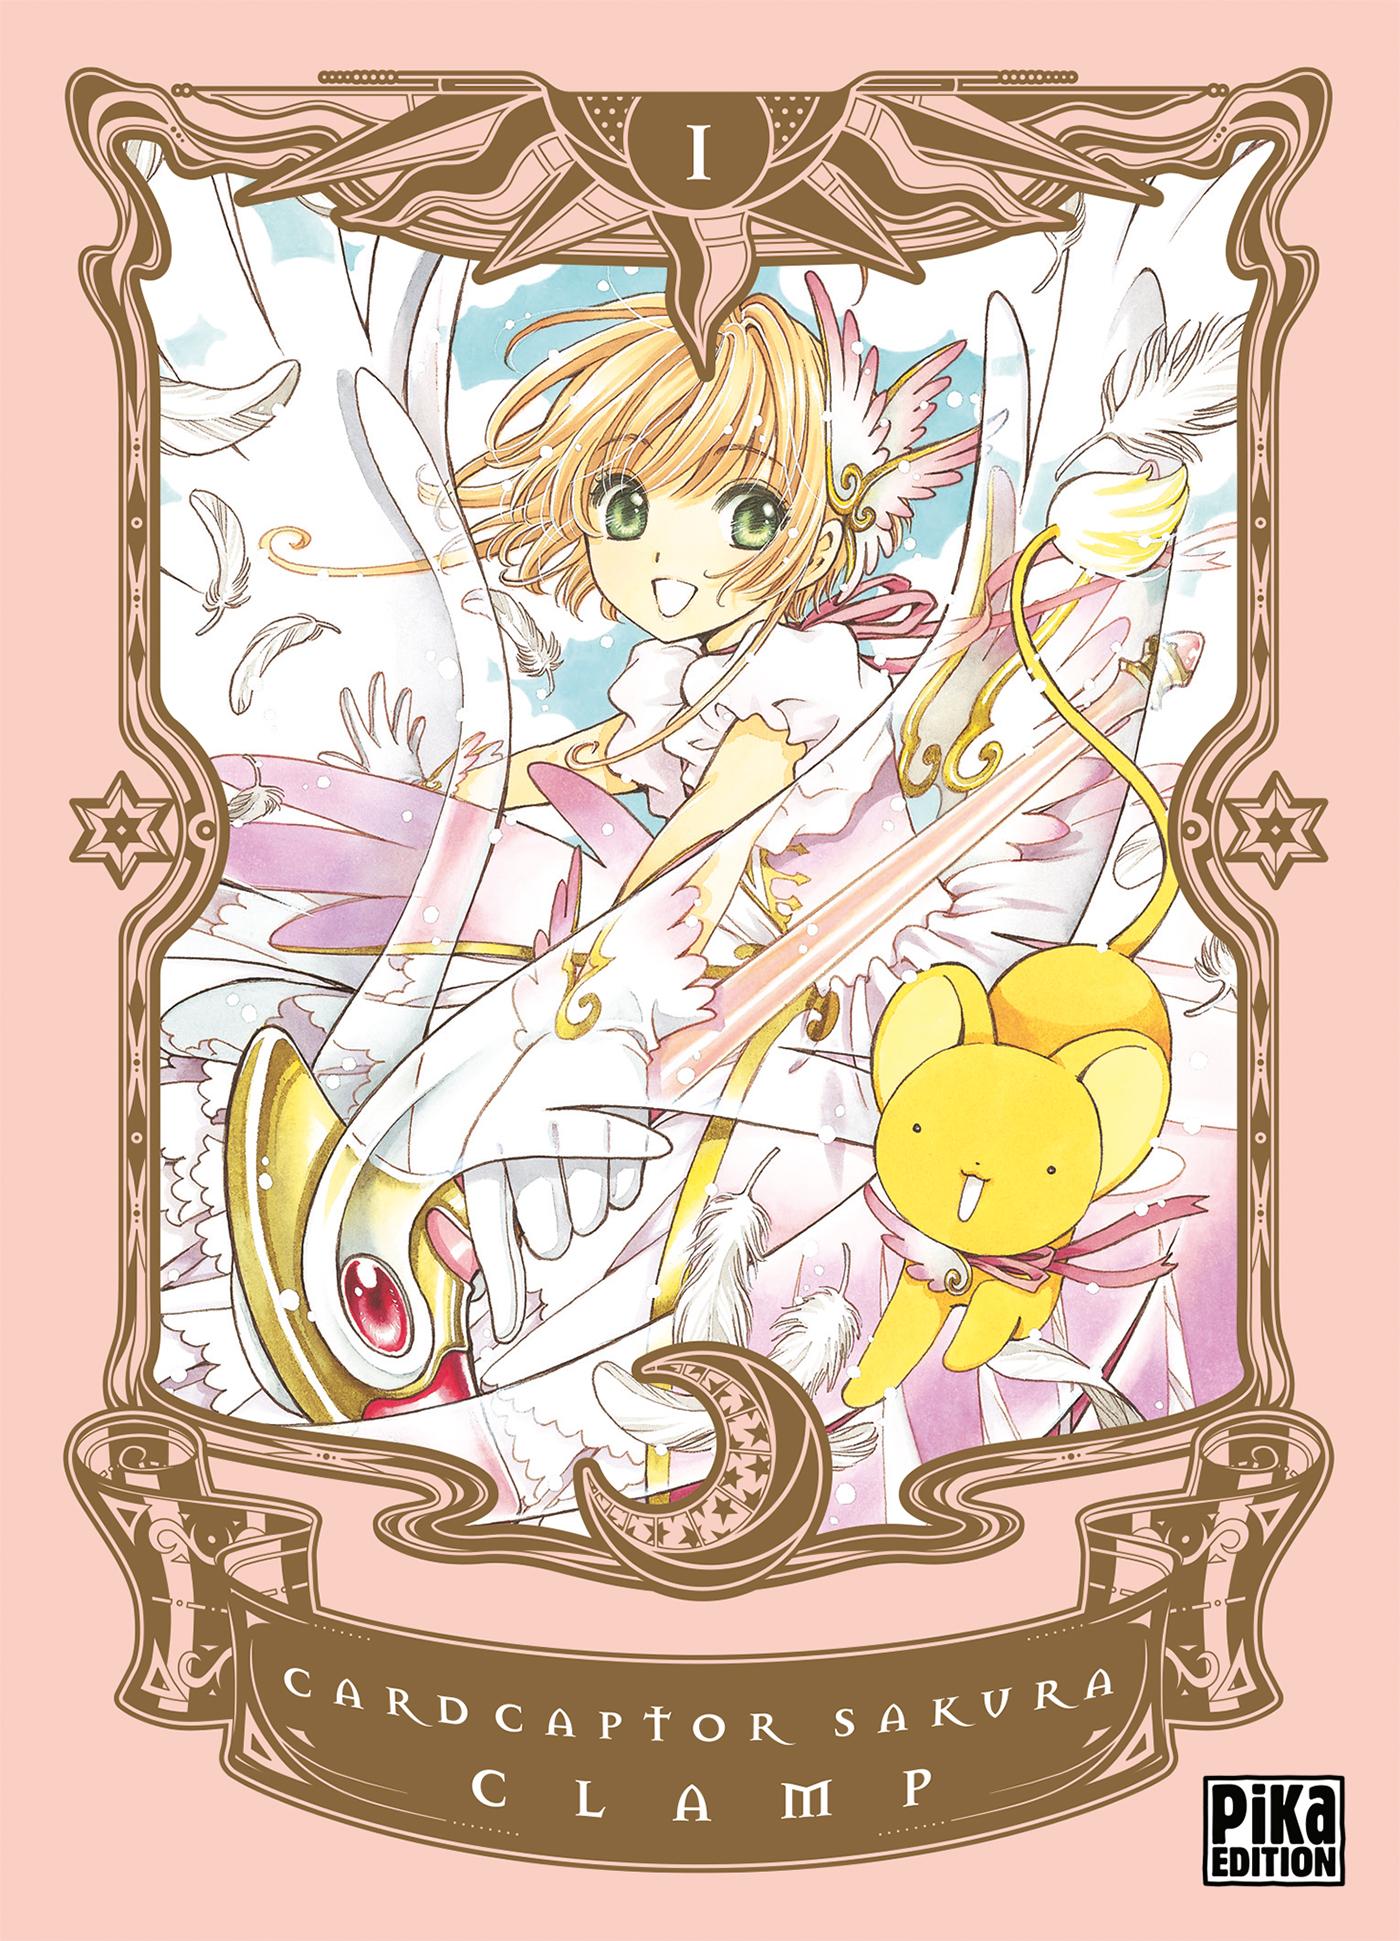 Card Captor Sakura Manga